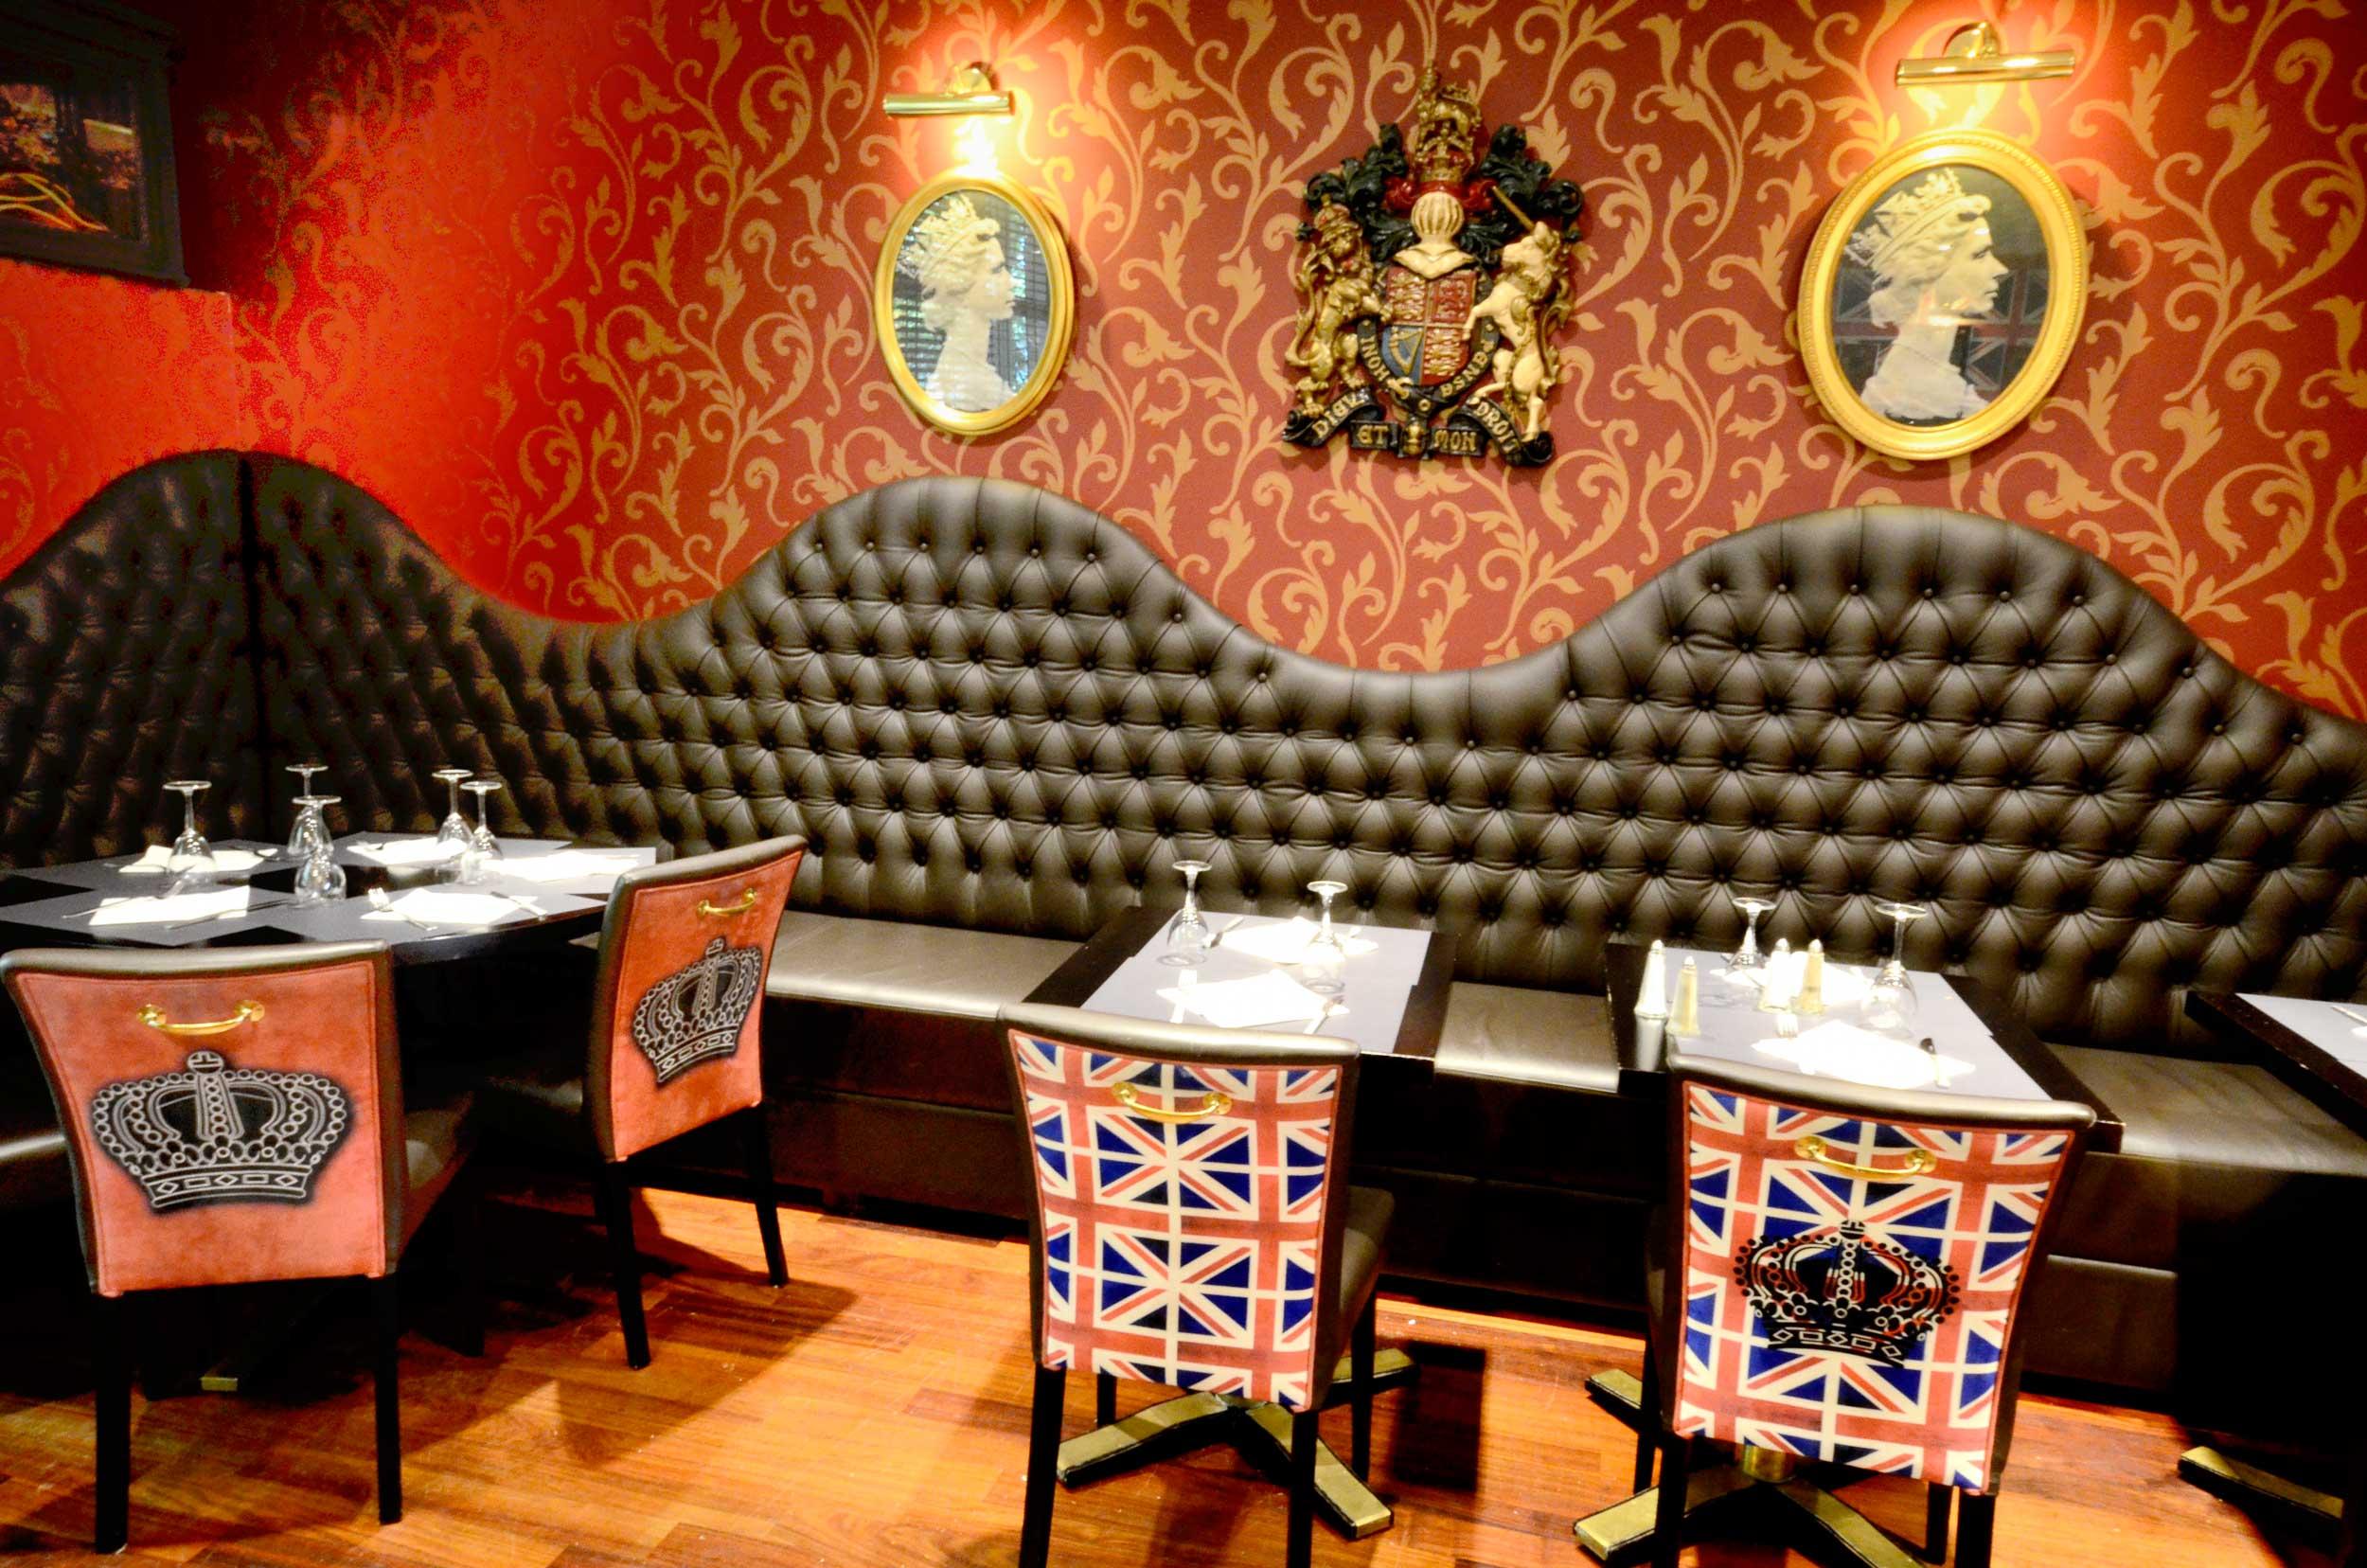 Greenhotels_roissy-parc-des-expositions_restaurant-3